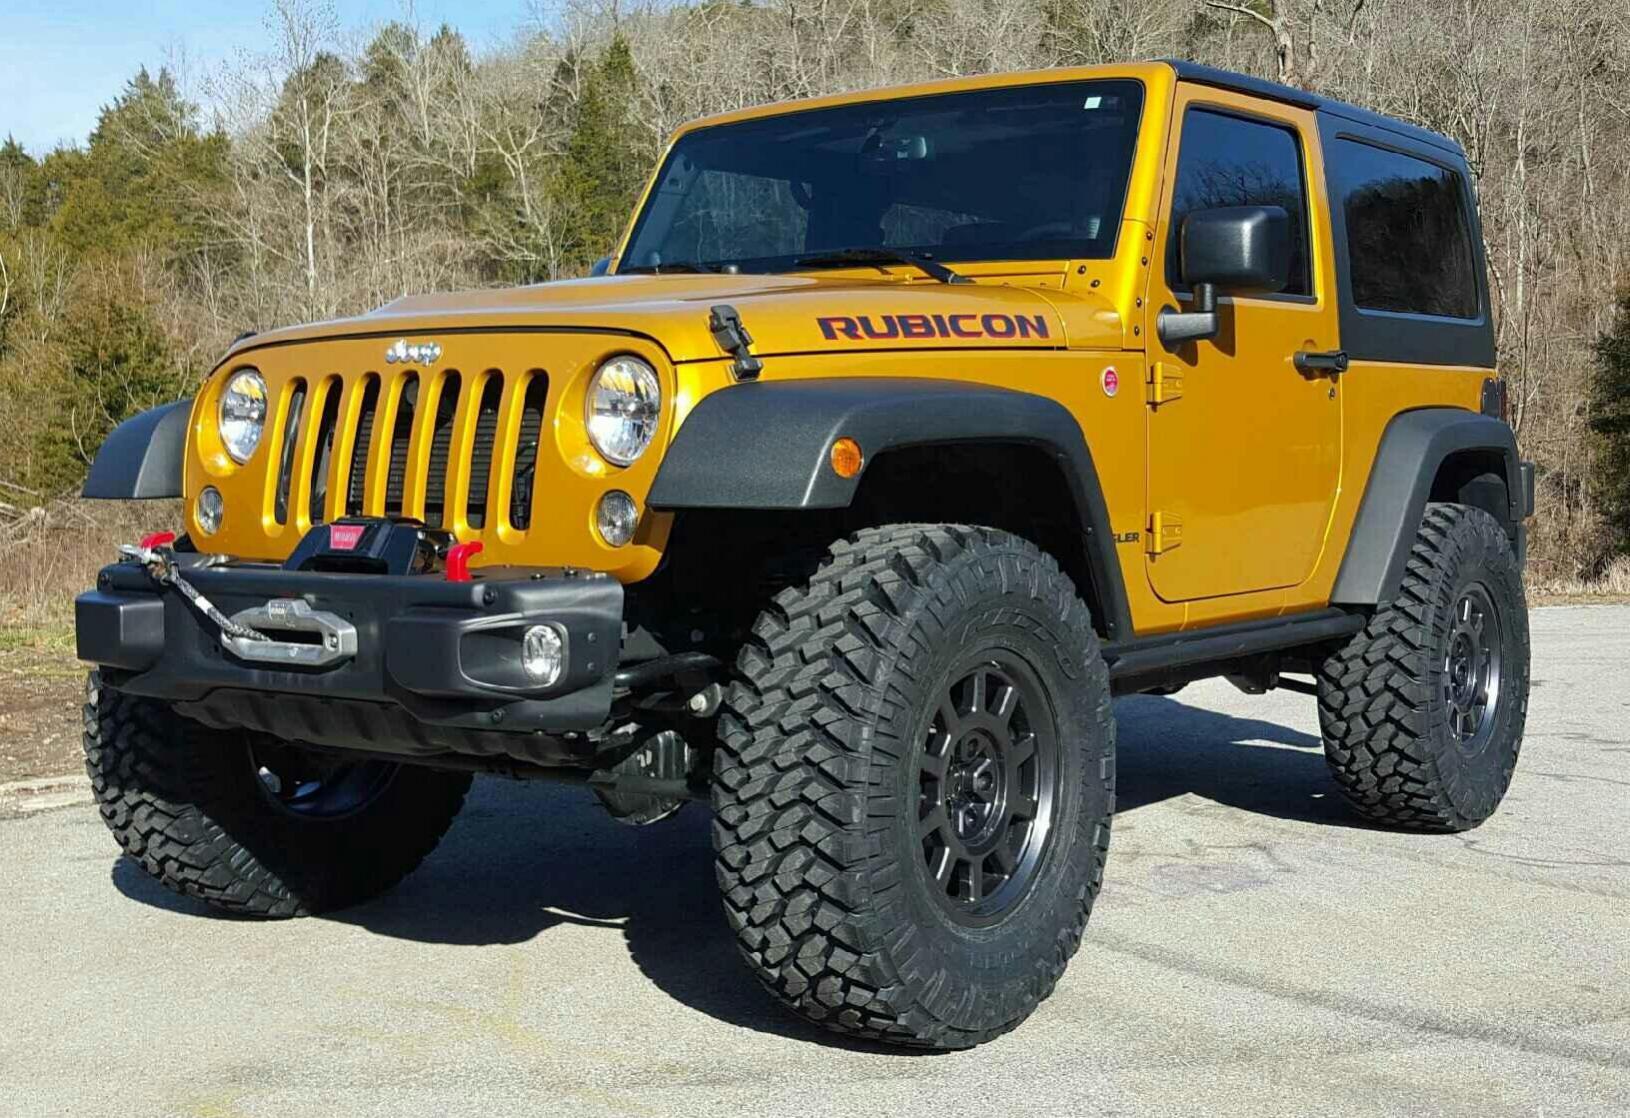 Butterface - JKowners.com : Jeep Wrangler JK Forum